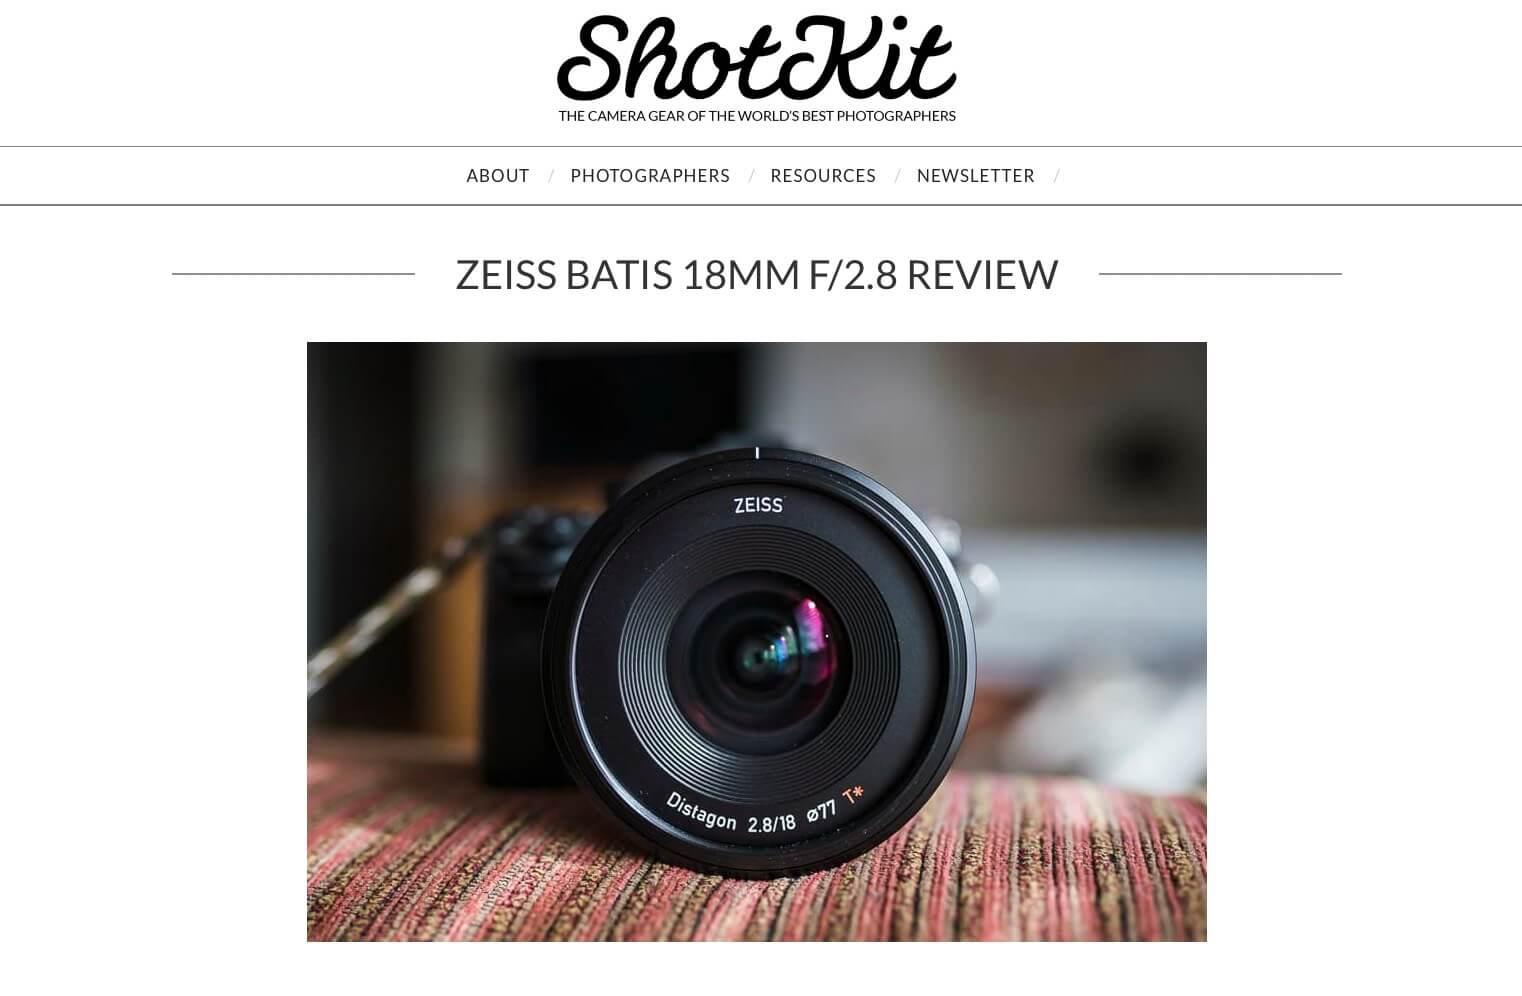 shotkit-batis-review.jpg